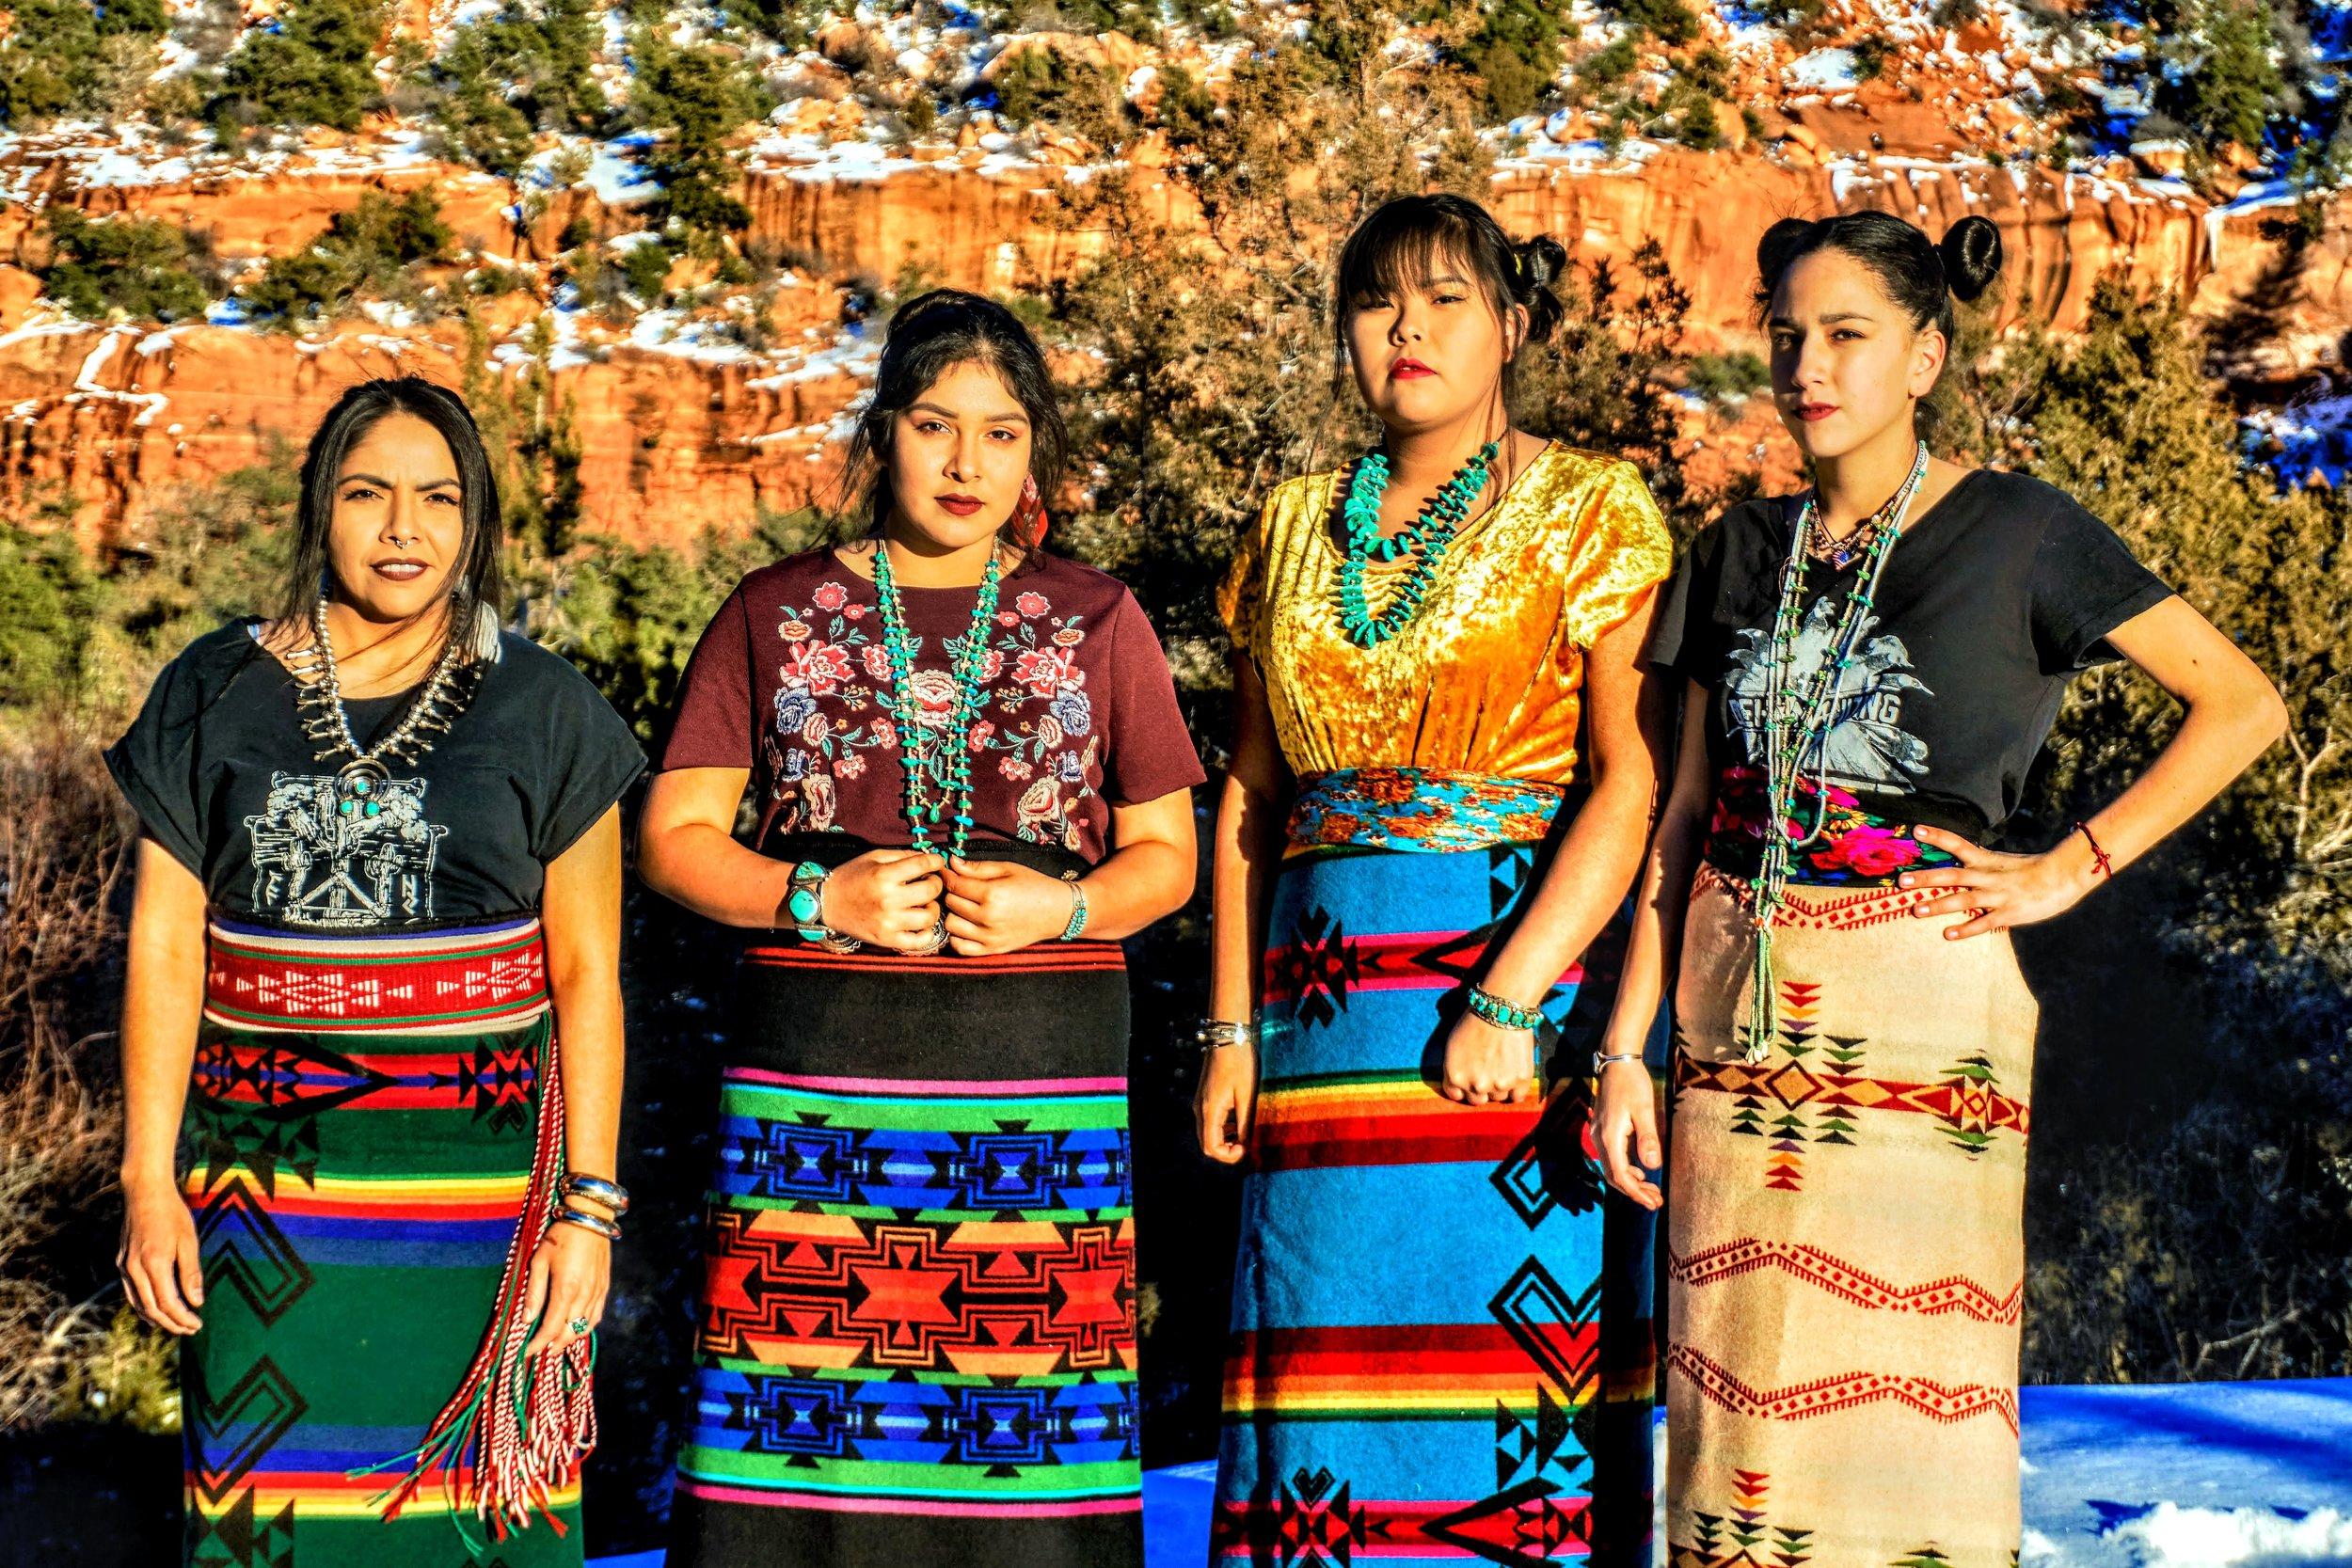 Kinaalda Femmes of the Chuska and Churrizos Mountains: Leo, Lilly, Nizhoni, Jayme Photo credit: Orlando Begaye Make-up: Danielle Joe Styled by: BrownGemmes